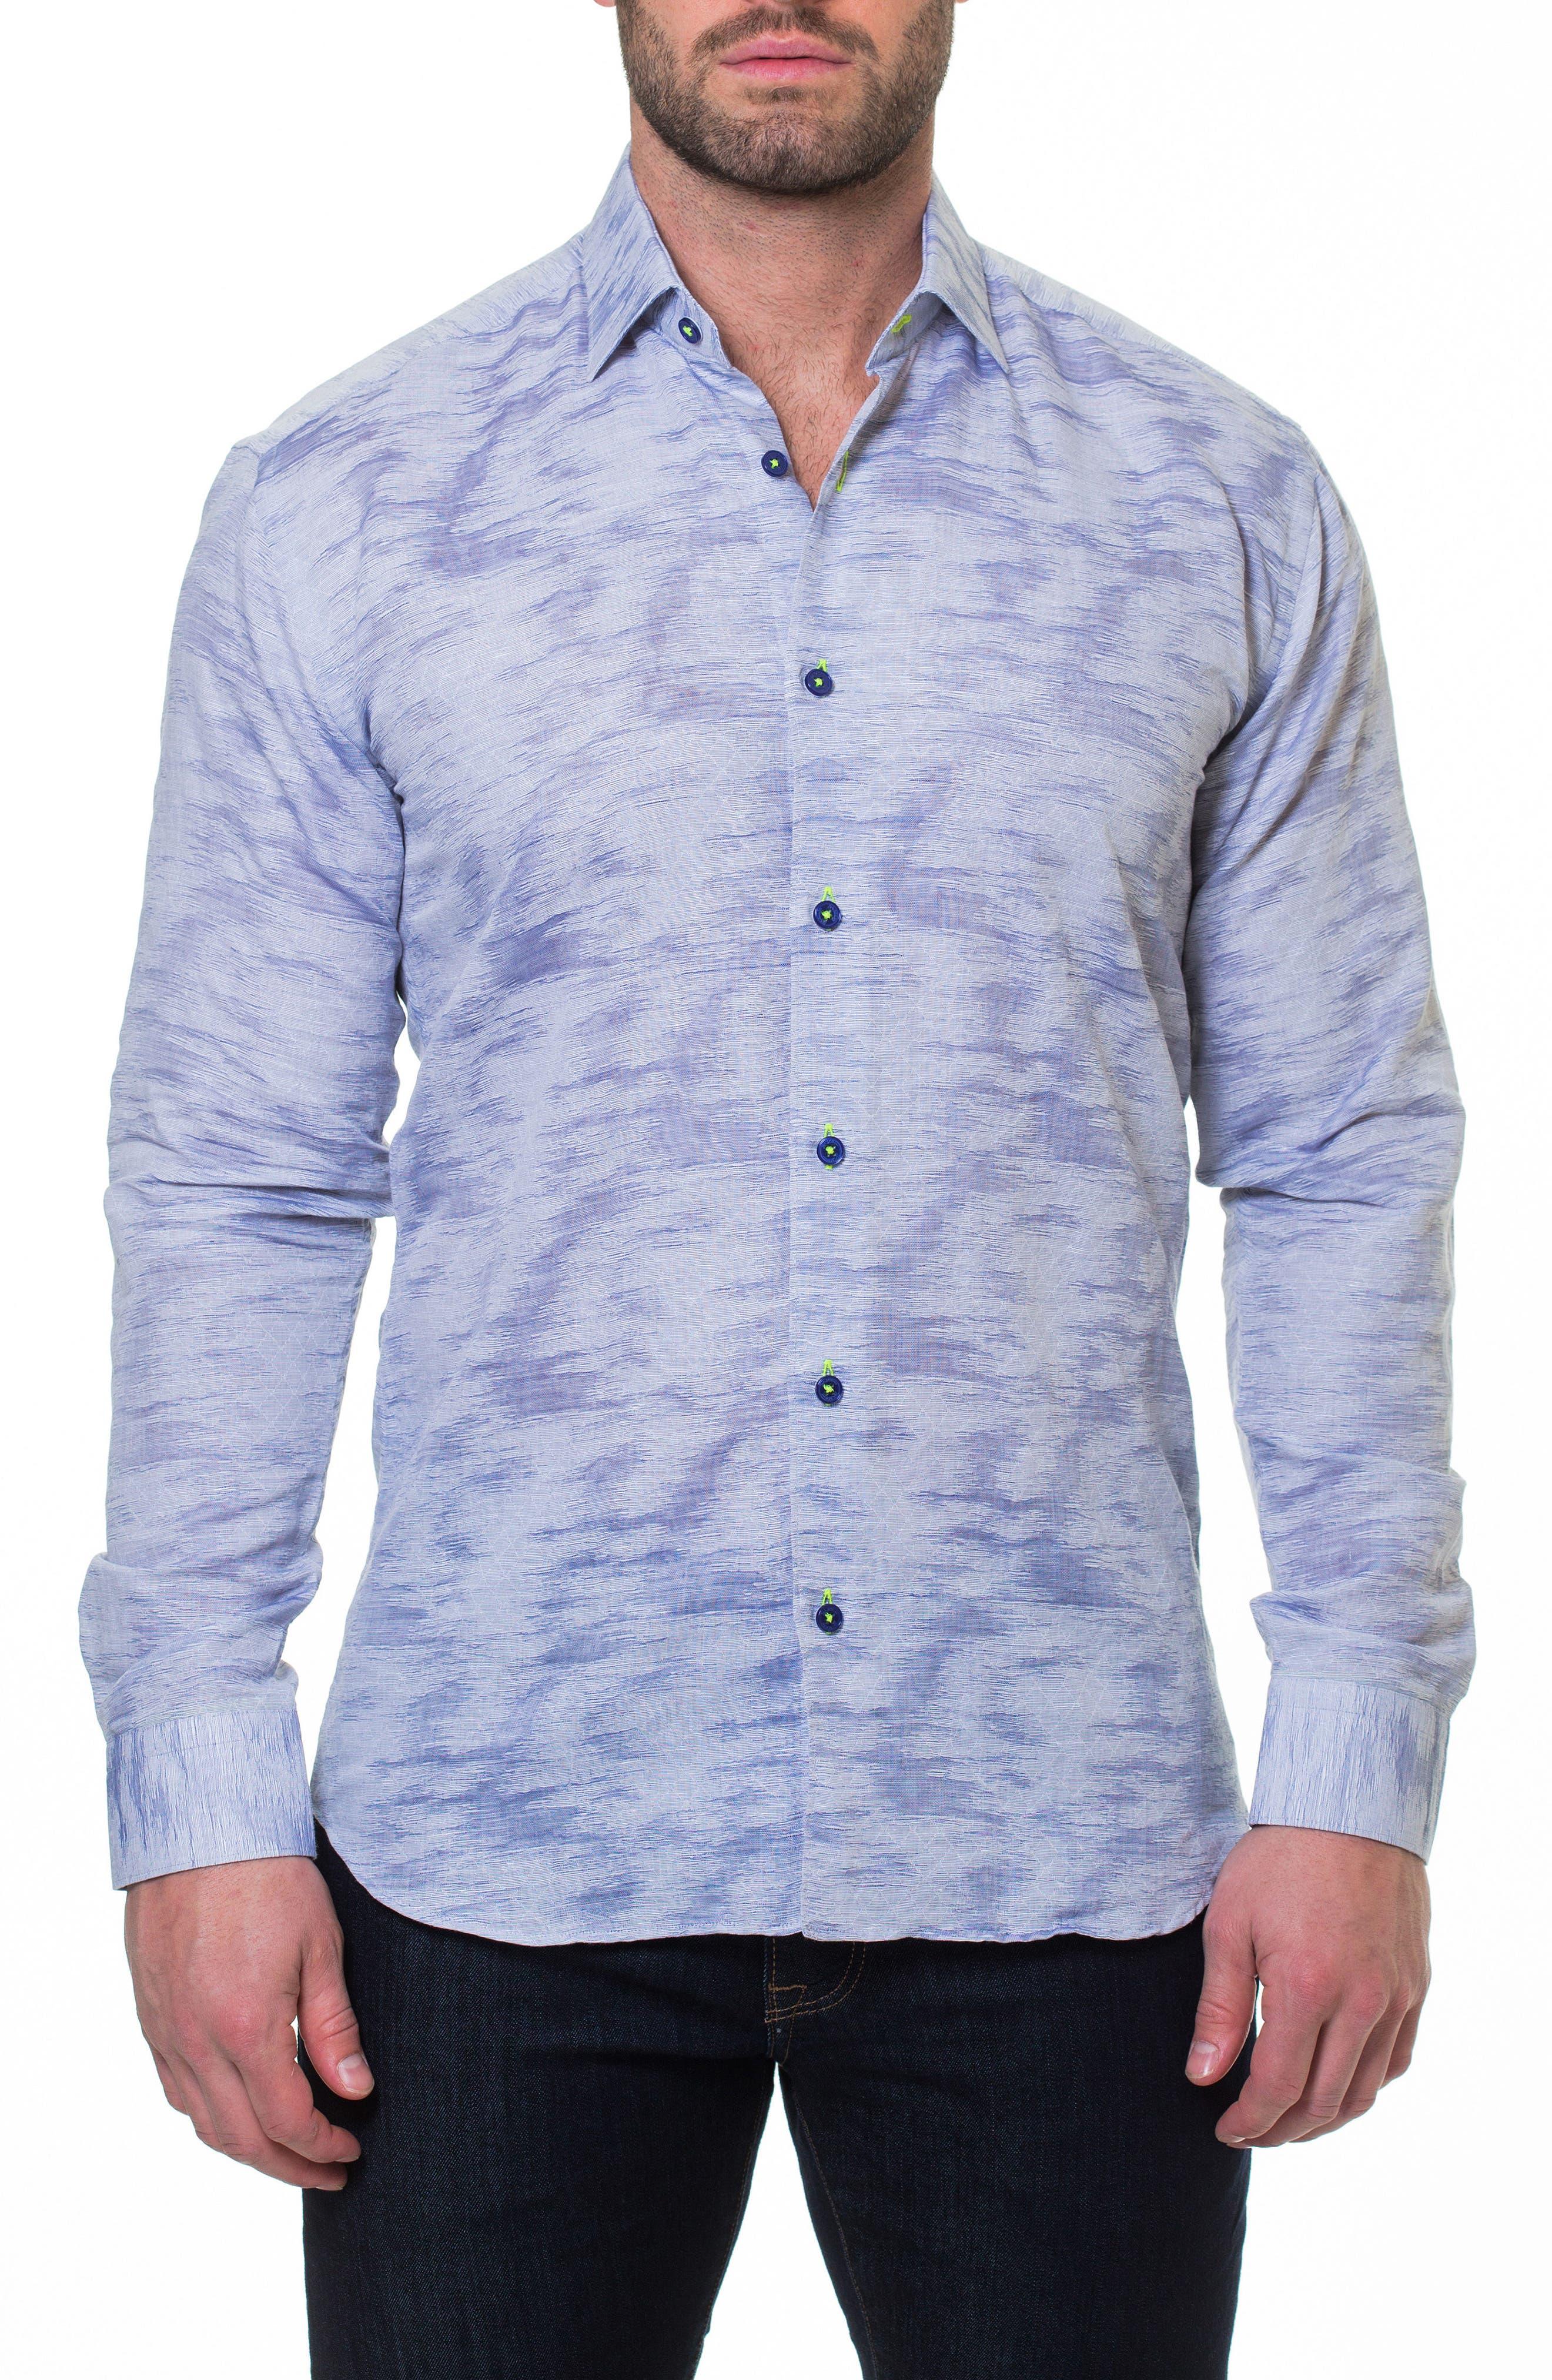 Luxor Richter Slim Fit Sport Shirt,                             Alternate thumbnail 4, color,                             030